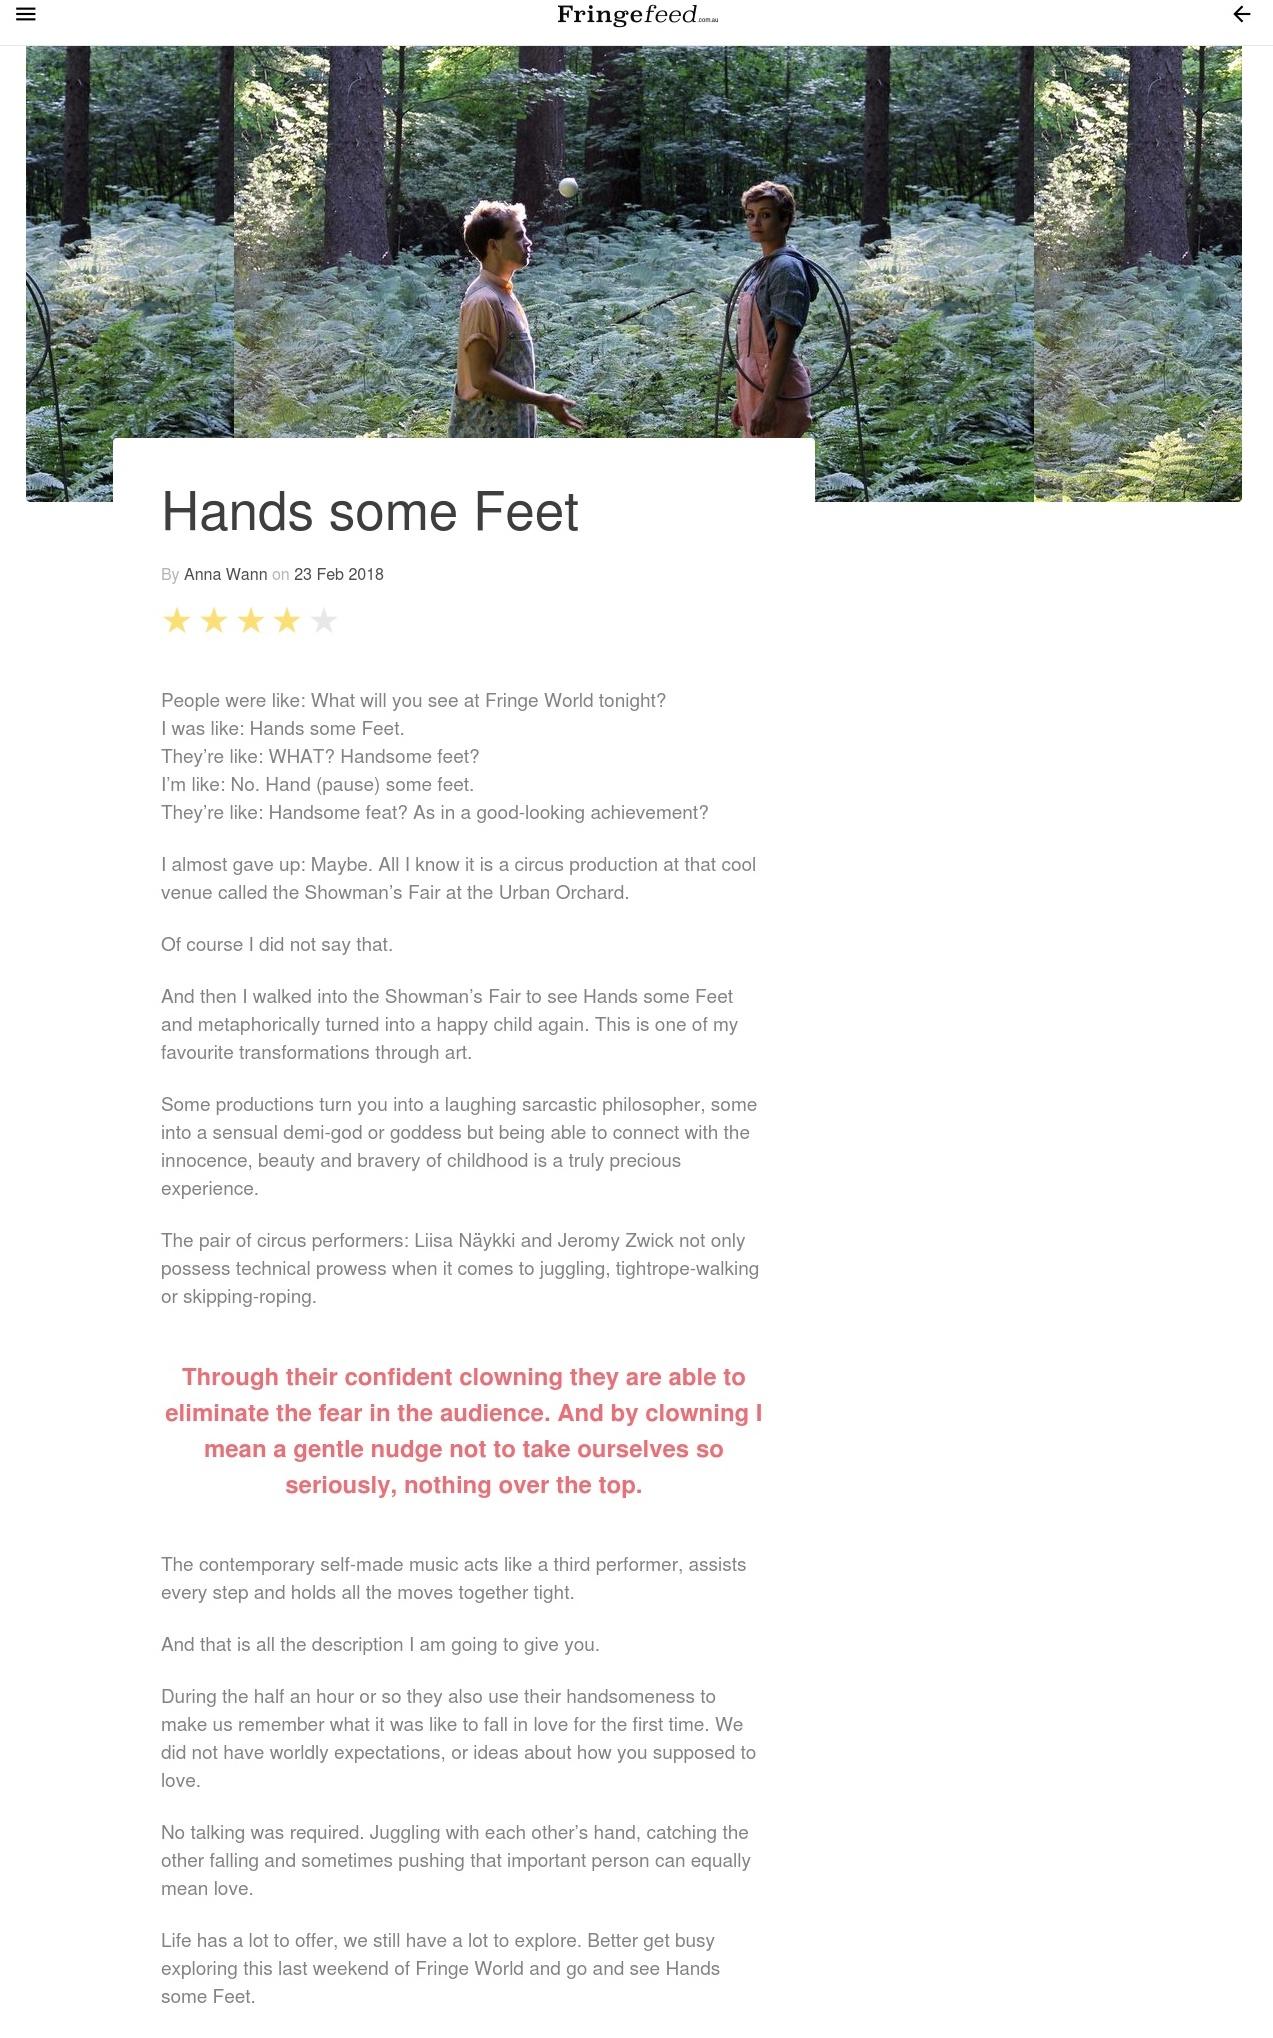 Fringefeed review 2018 Anna Wann.jpeg